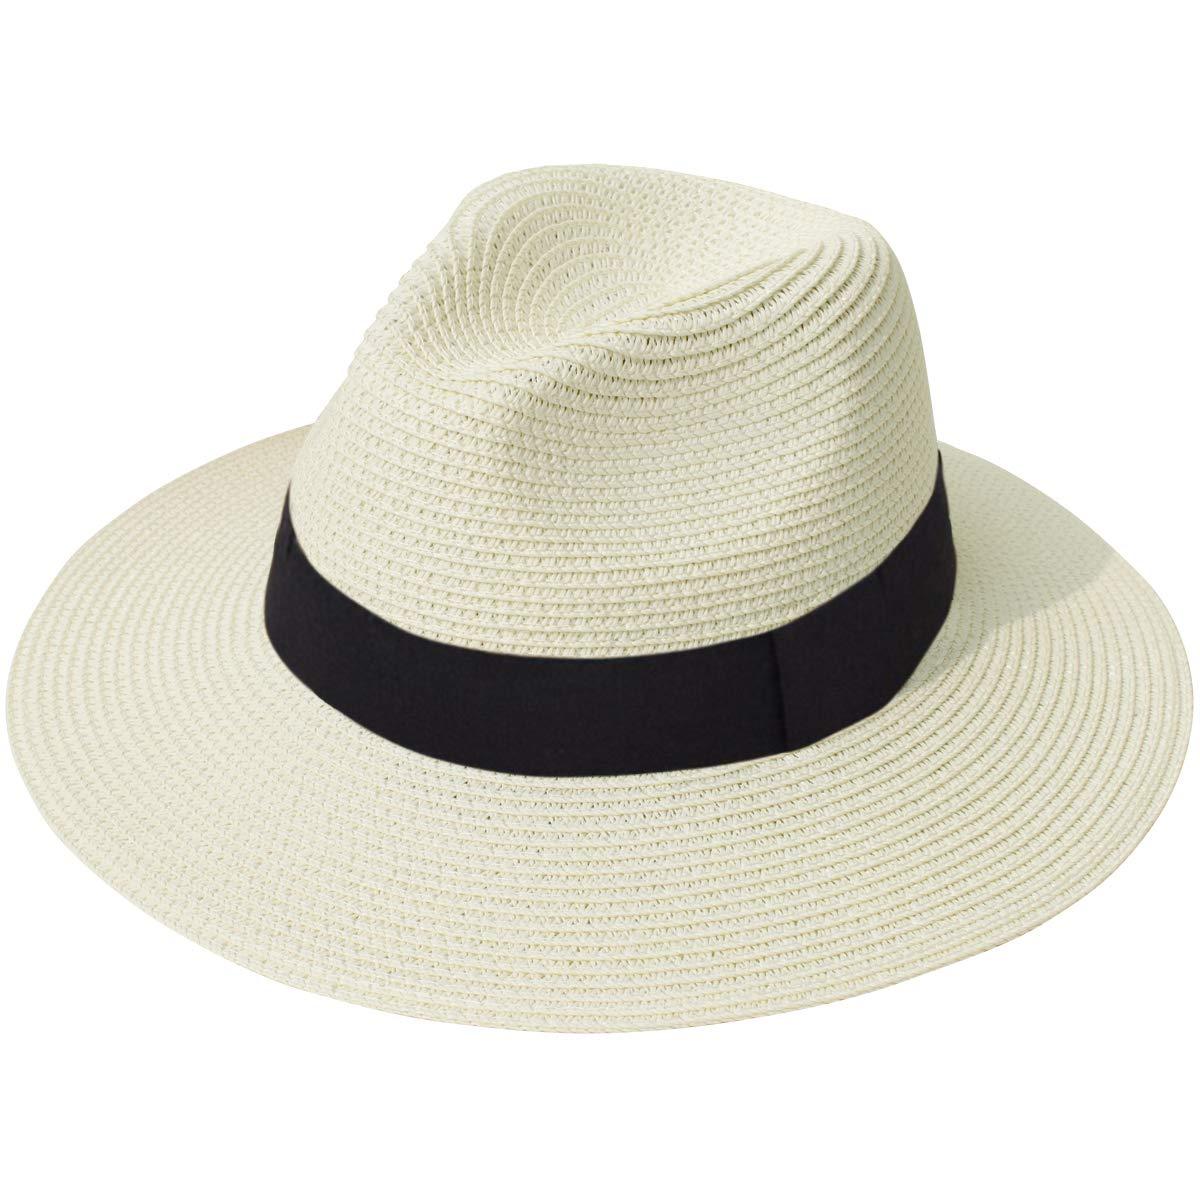 26457b0cee49f Women Wide Brim Straw Panama Roll up Hat Fedora Beach Sun Hat UPF50+  Amazon.ca   Clothing   Accessories